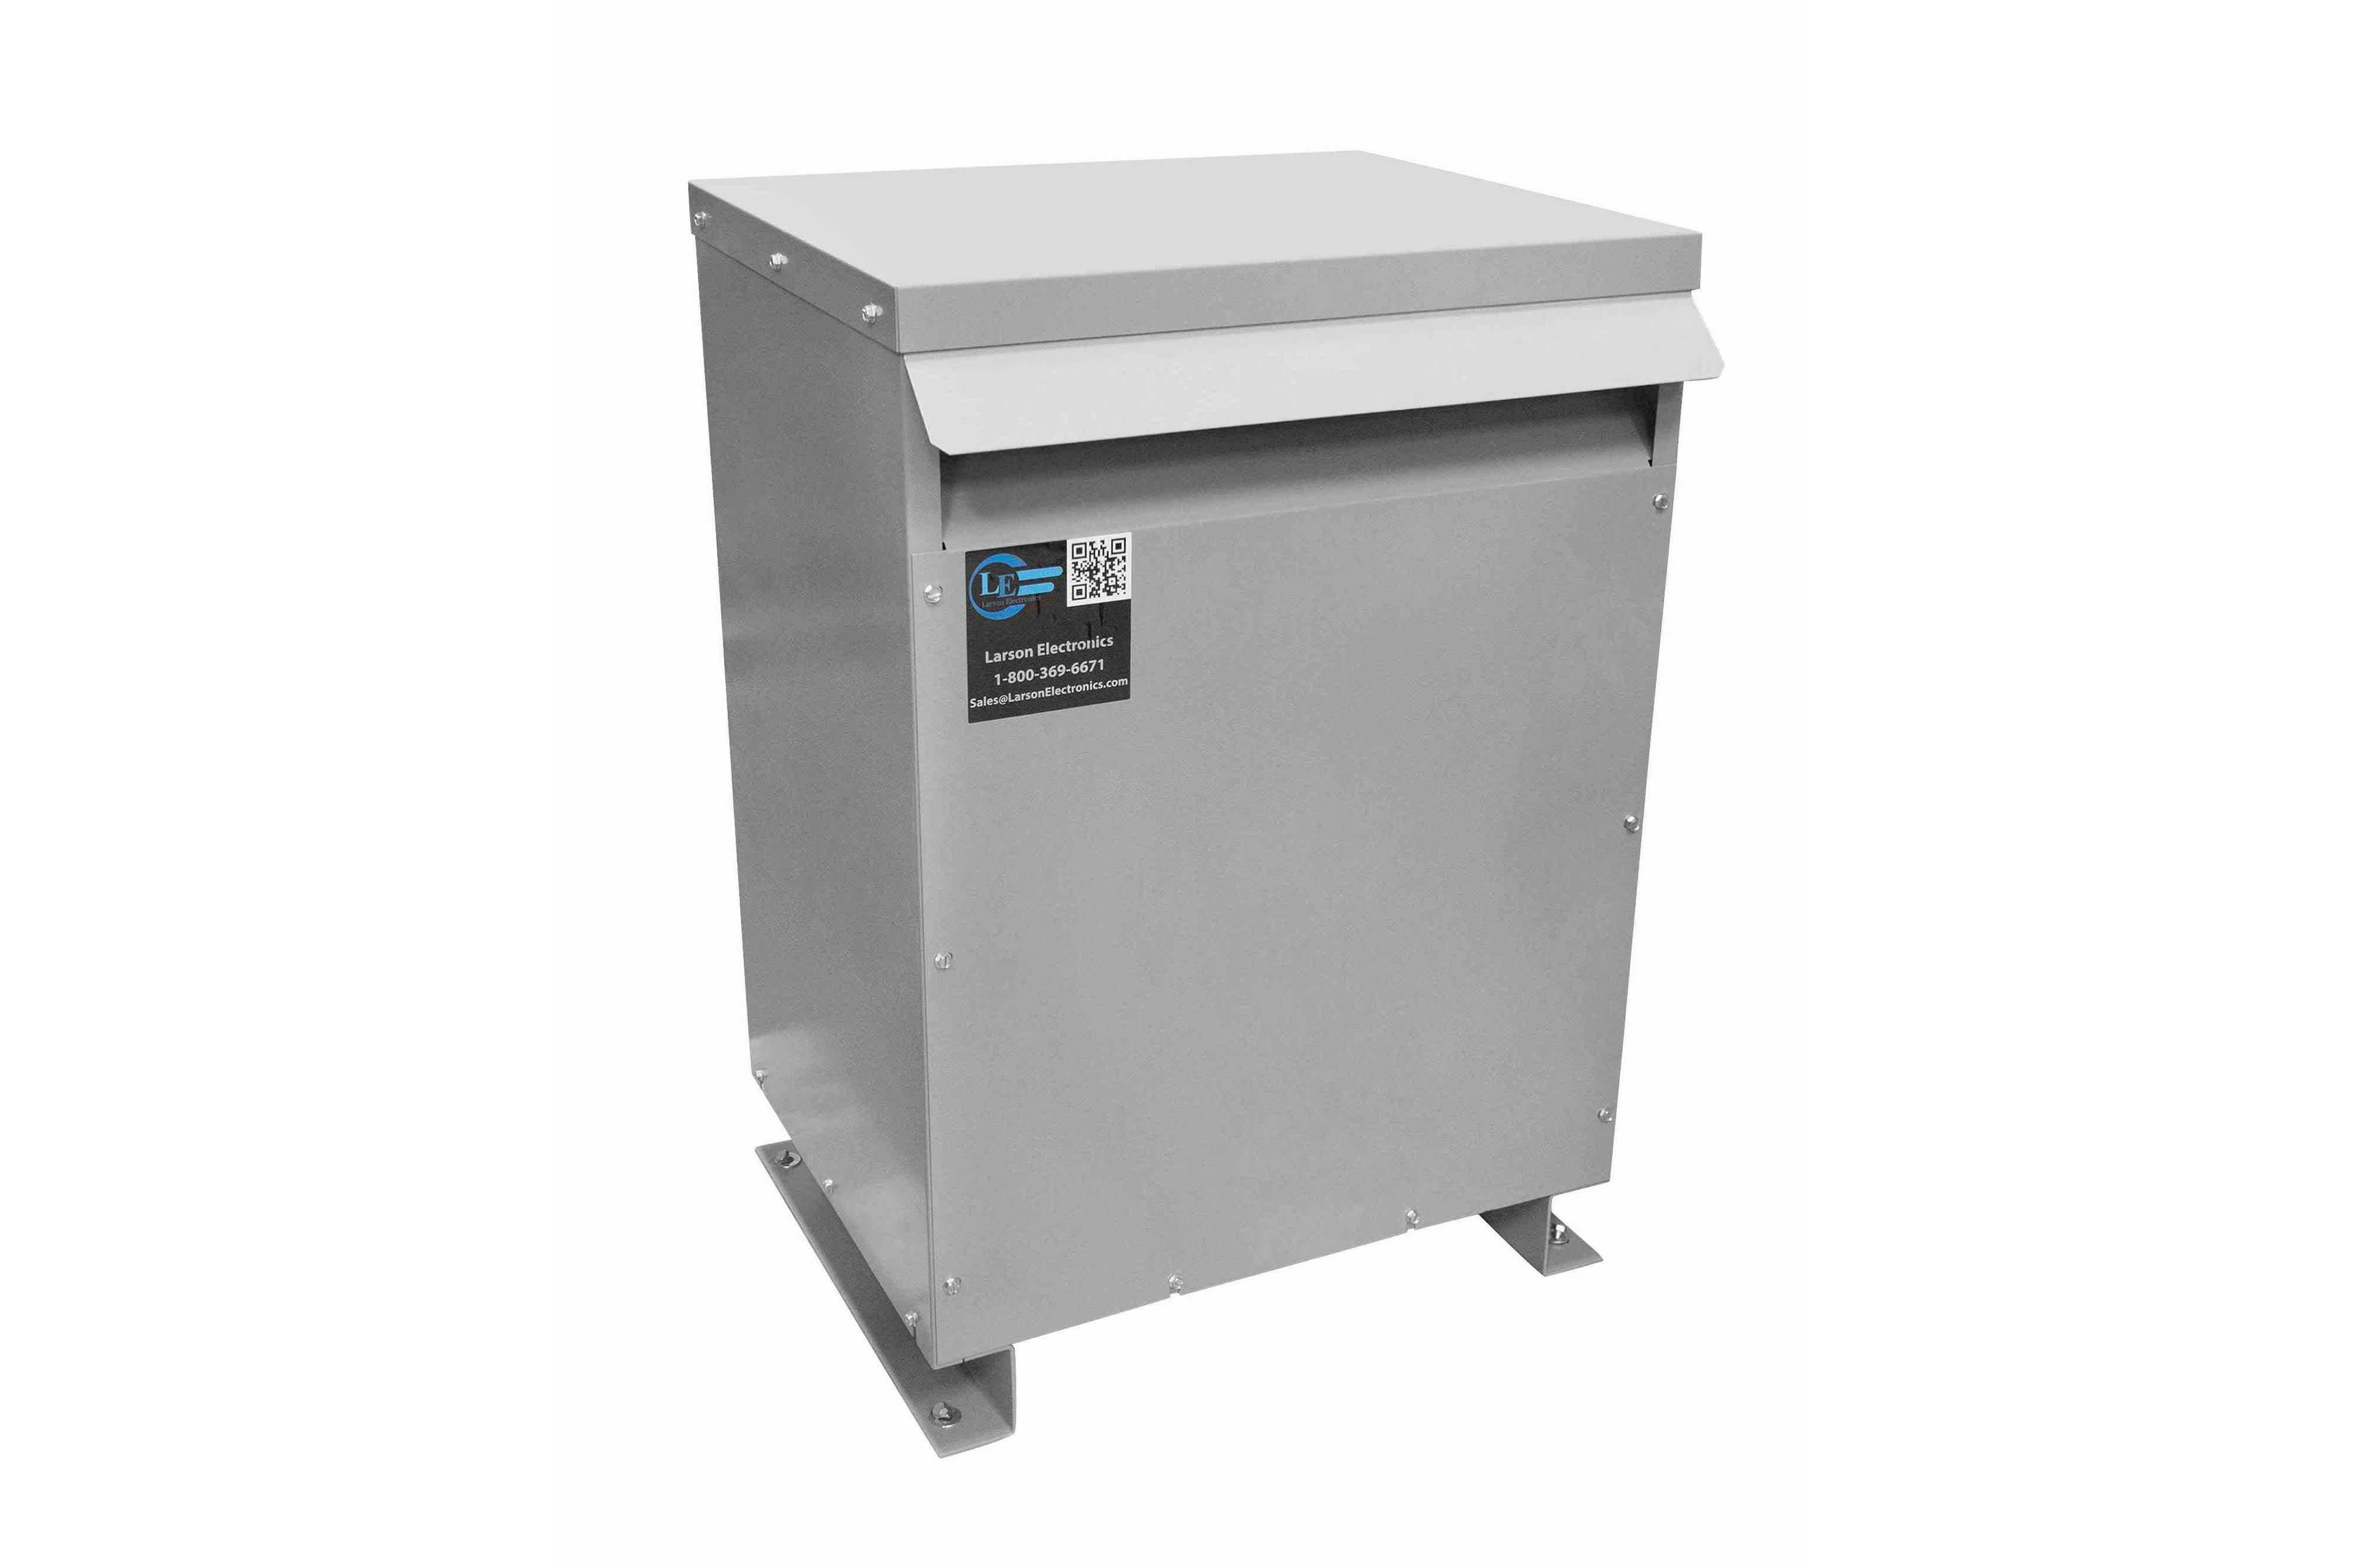 45 kVA 3PH Isolation Transformer, 240V Wye Primary, 208Y/120 Wye-N Secondary, N3R, Ventilated, 60 Hz